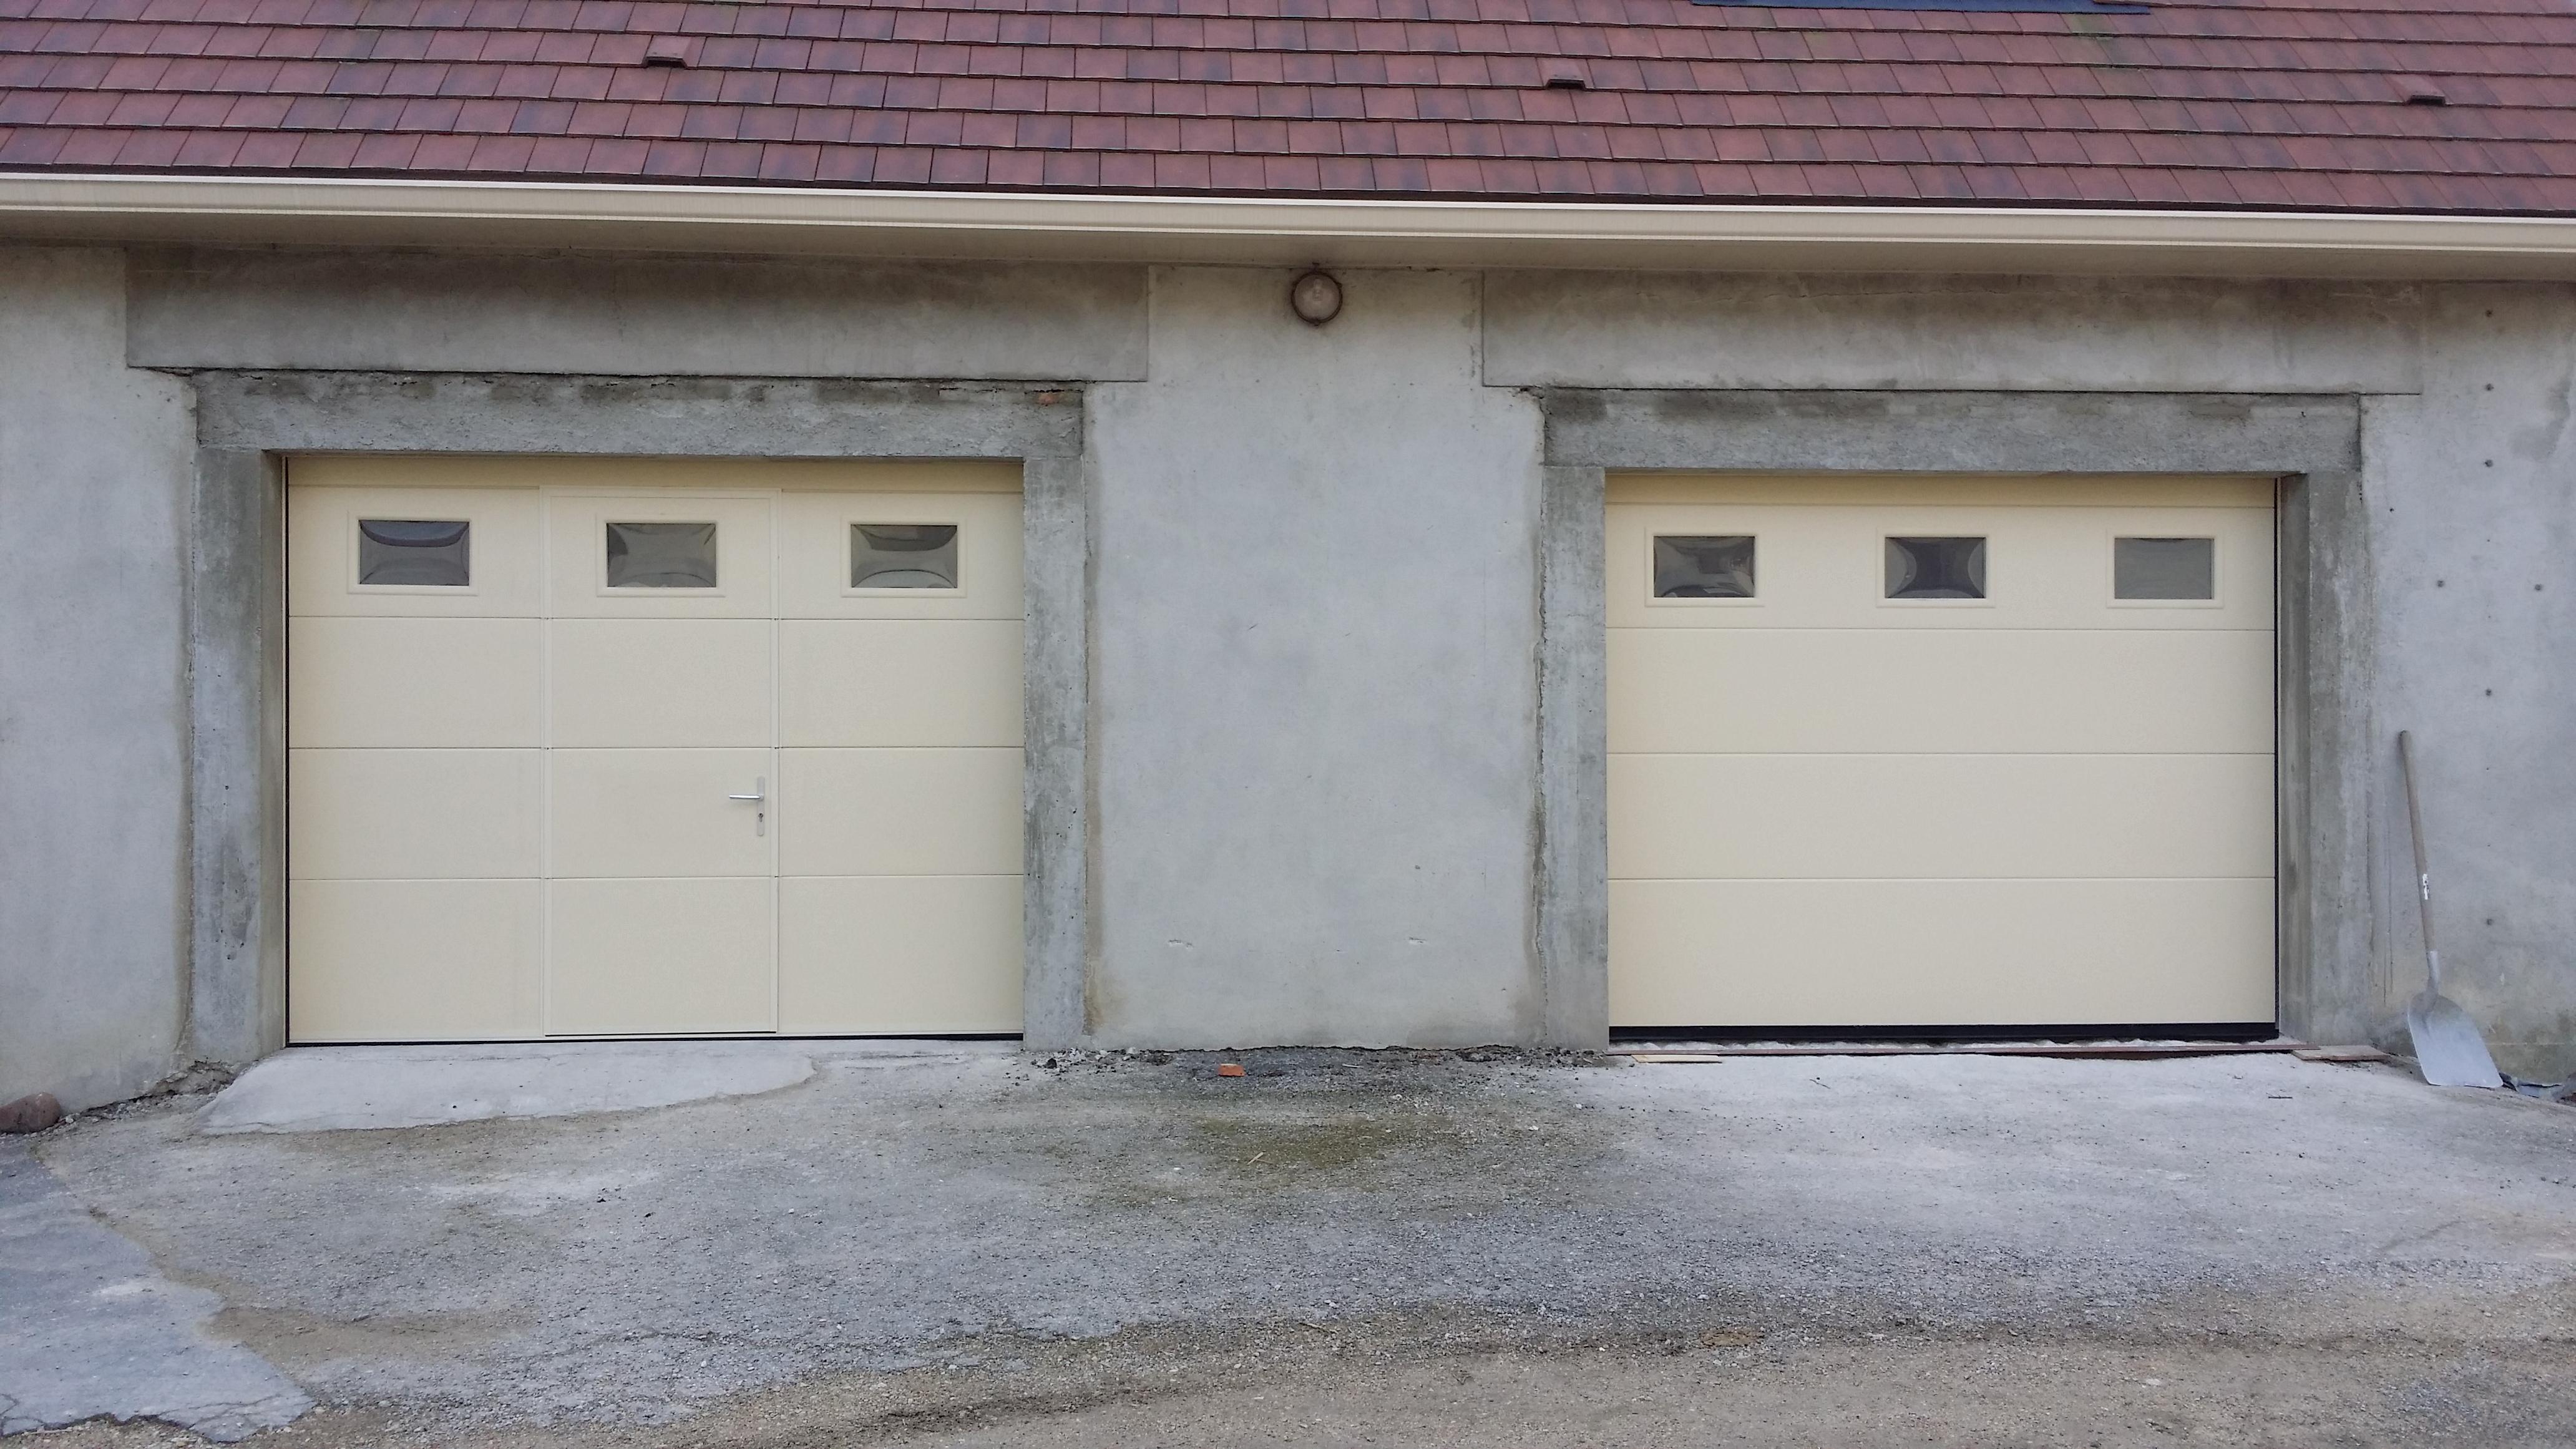 Porte de garage menuiserie lemaire broyes s zanne for Garage lemaire hellemmes